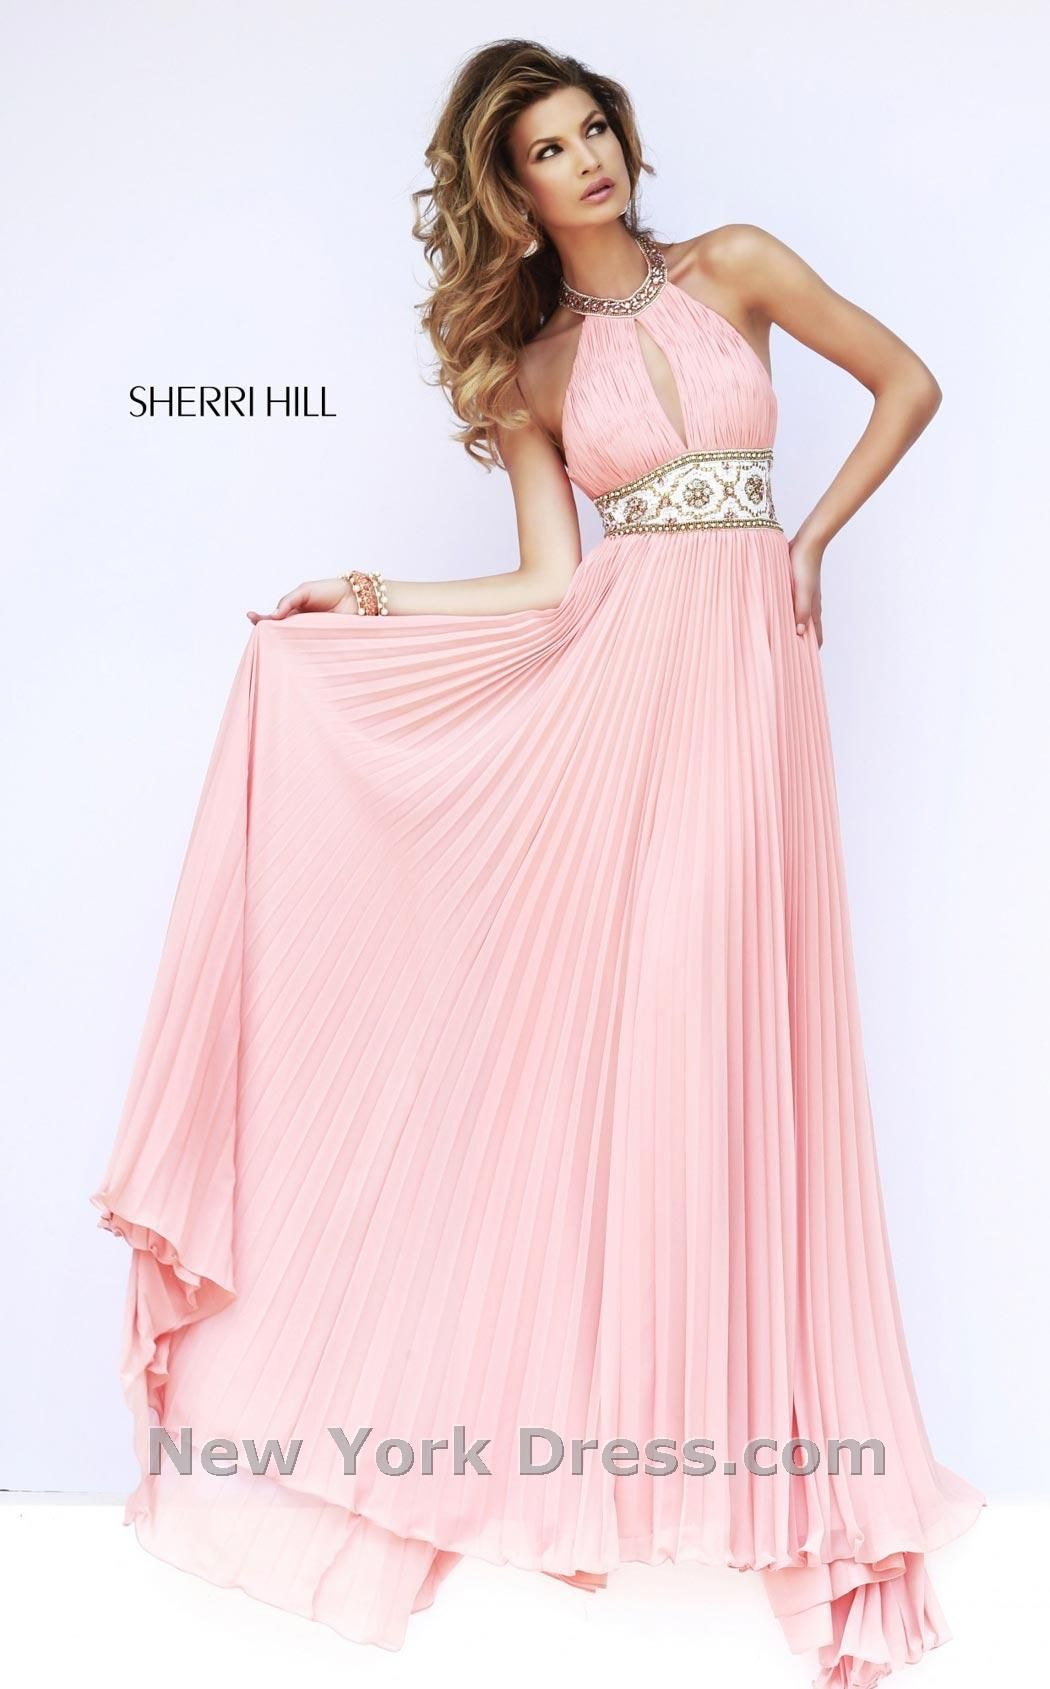 Sherri hill dress prom pretty clothes and clothes